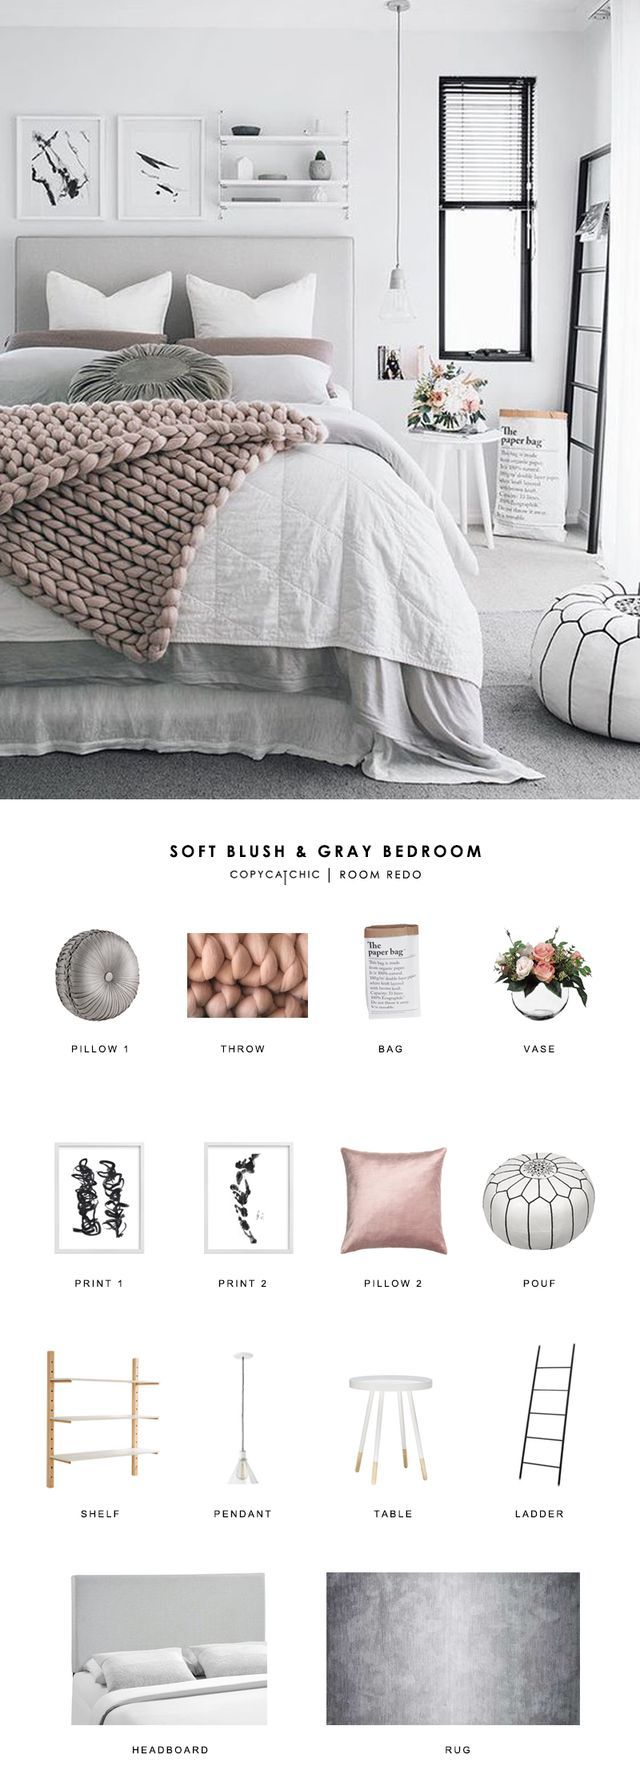 Copy cat chic room redo in main bedroom pinterest shelves